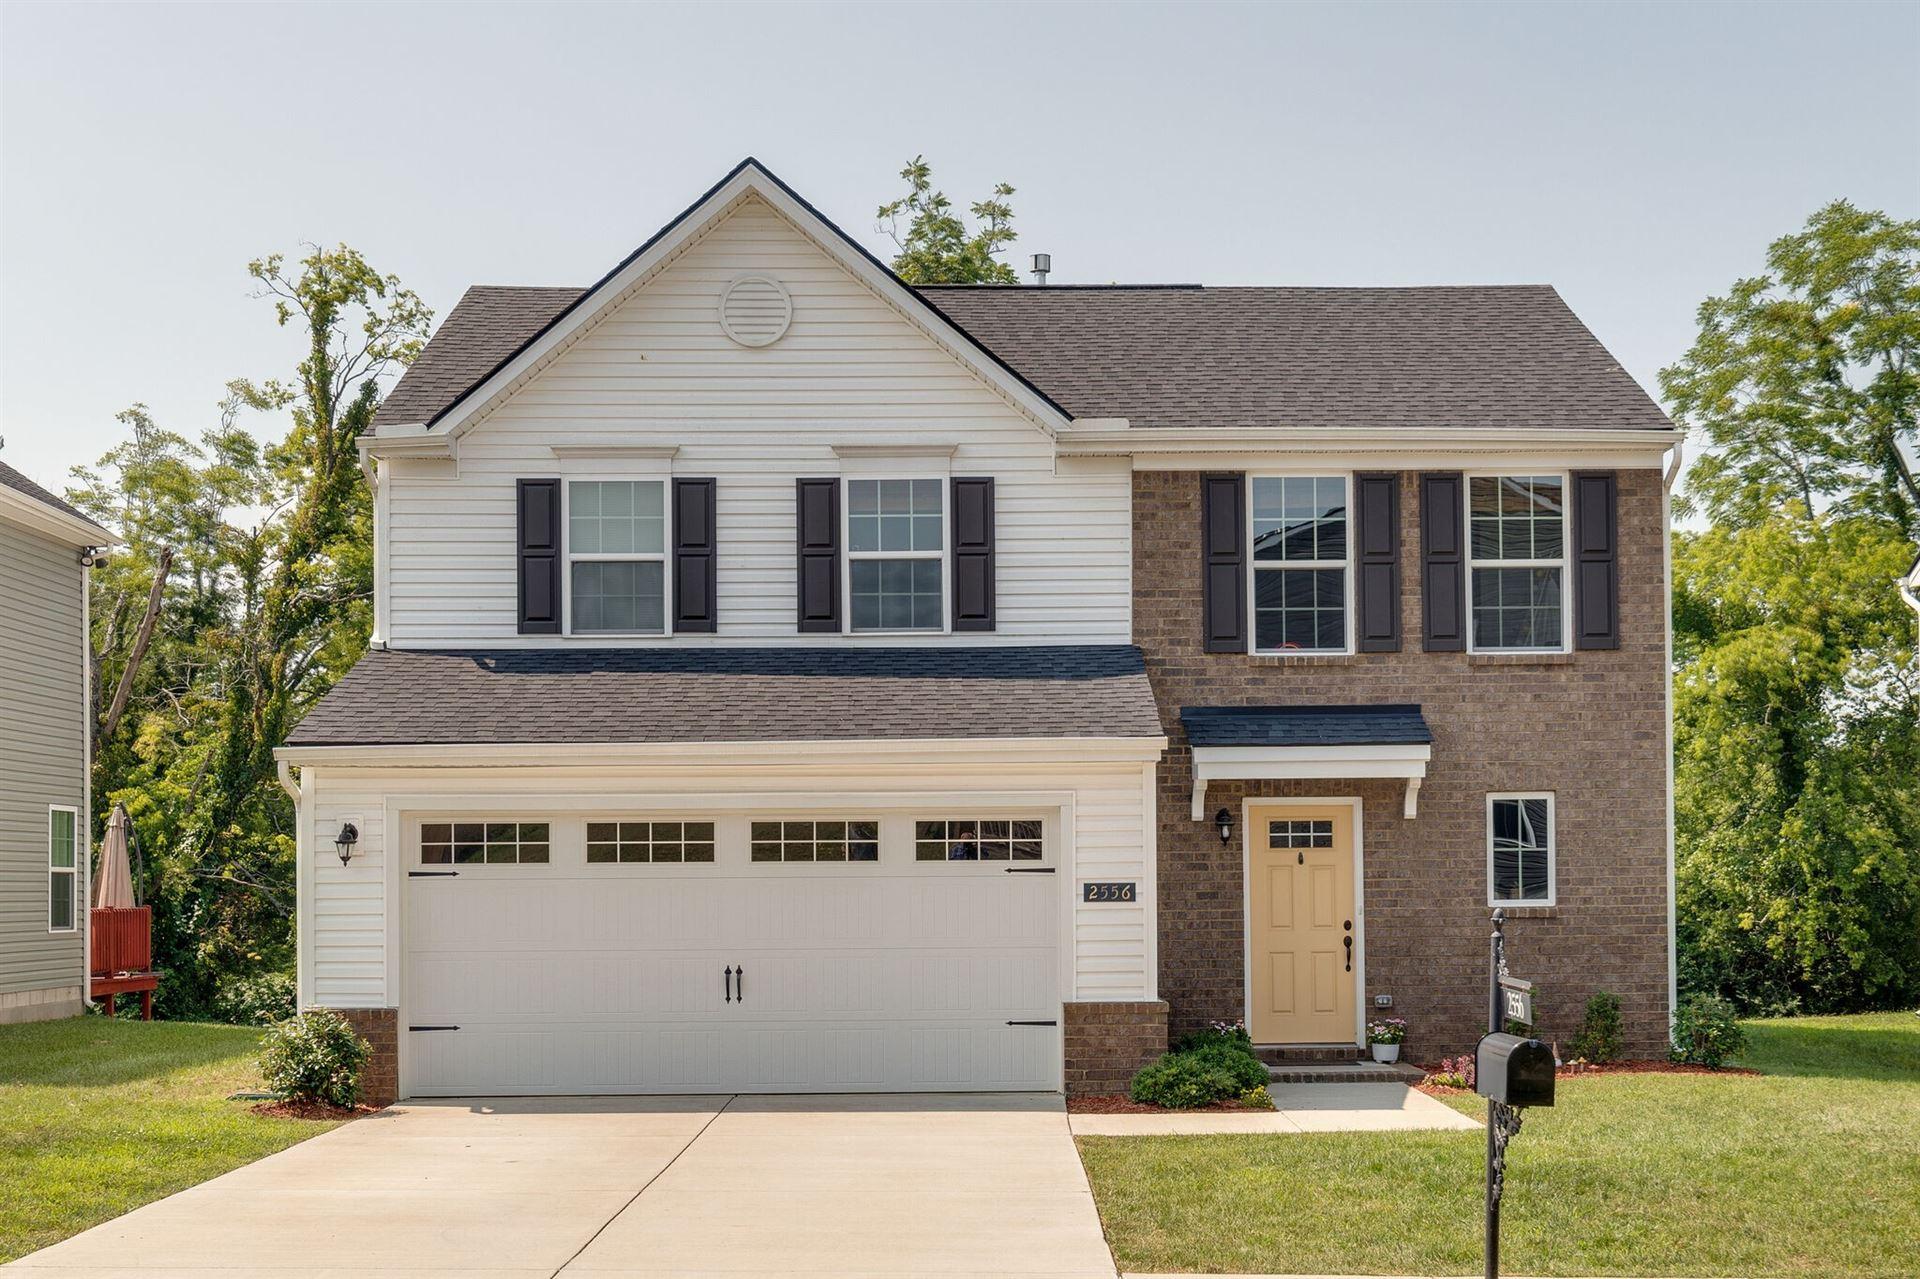 2556 Grove Park Way, Columbia, TN 38401 - MLS#: 2275957